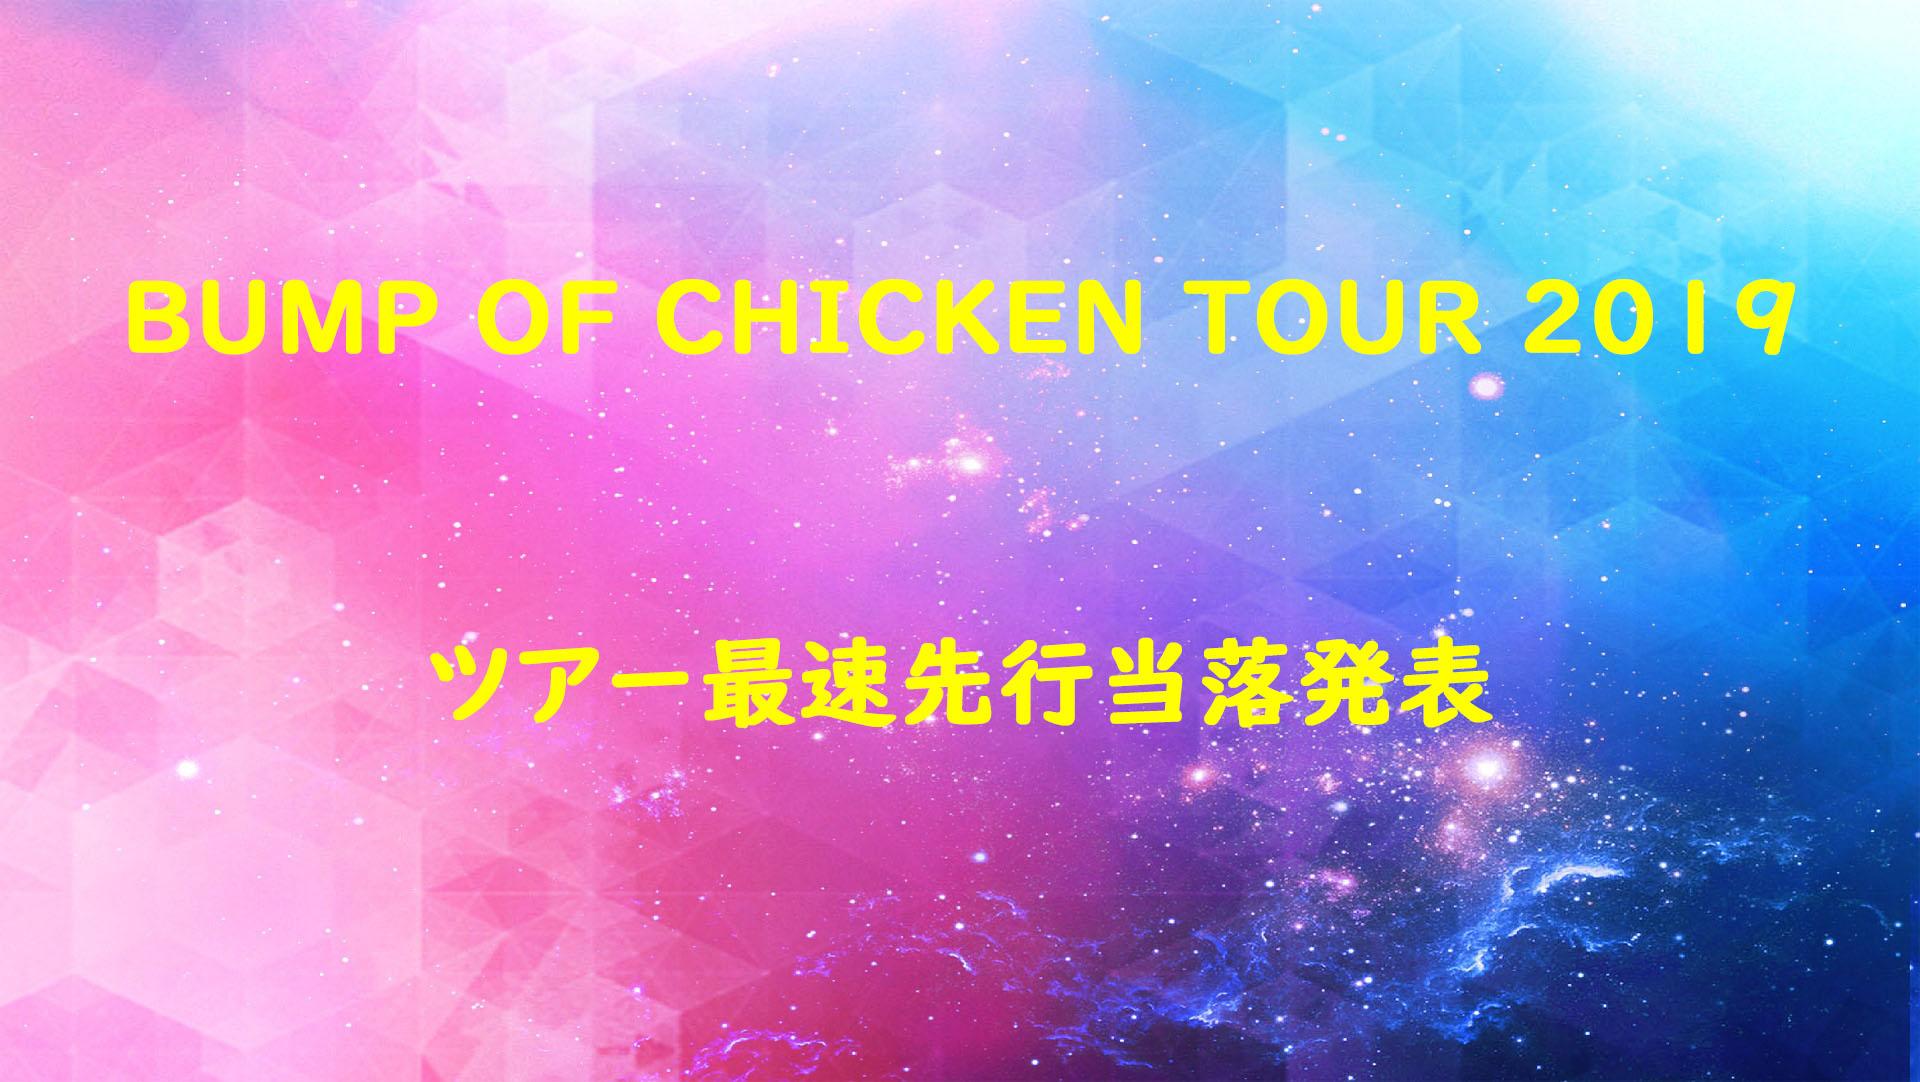 BUMP OF CHICKEN TOUR 2019 ツアー最速先行の当落発表!!